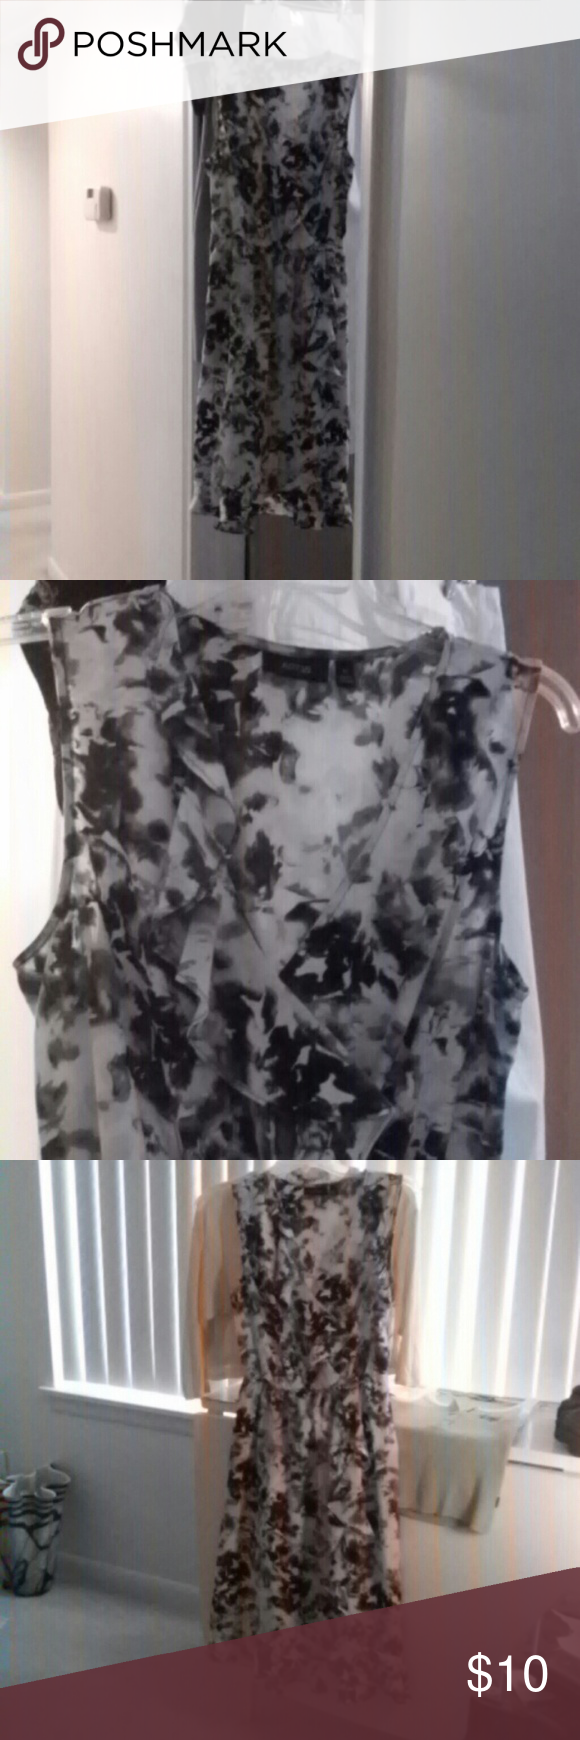 Cute apt. 9 smoky Gray black and white dress M Super cute Apt 9 dress - roomy medium with stretch waist. Fits like an 8-10. Has a ruffled front and hem. Apt. 9 Dresses